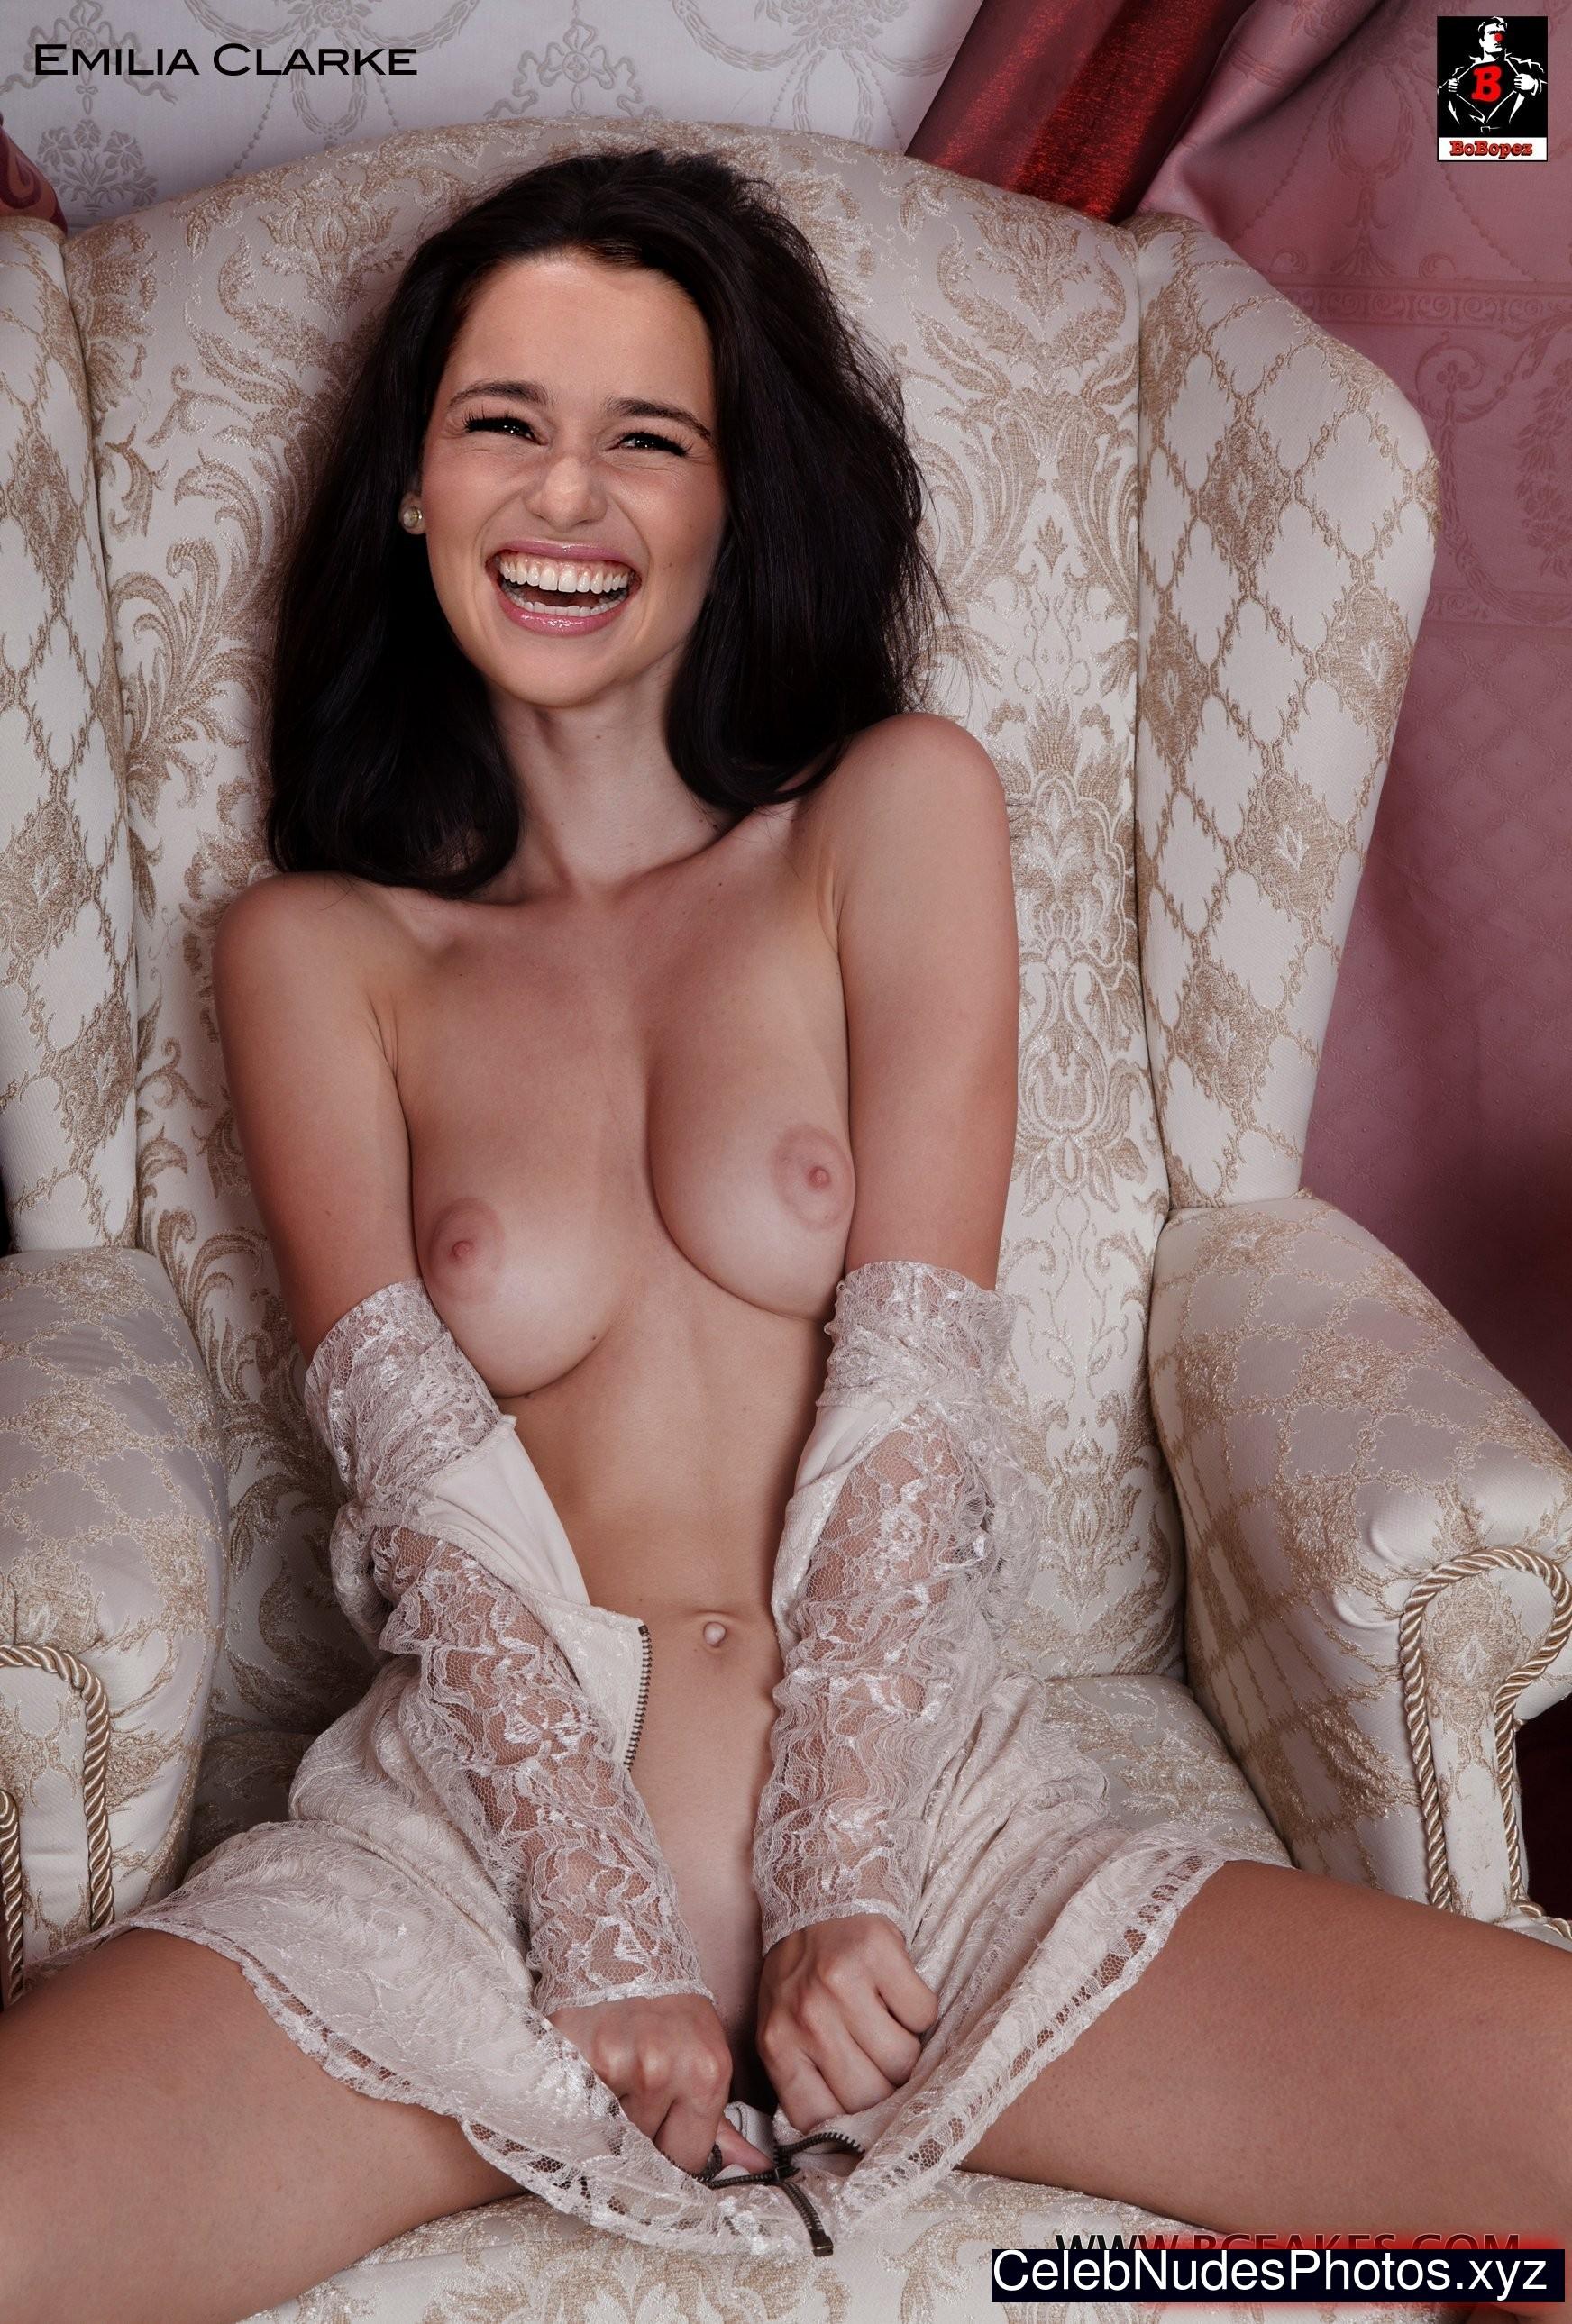 Emilia Clark Porno